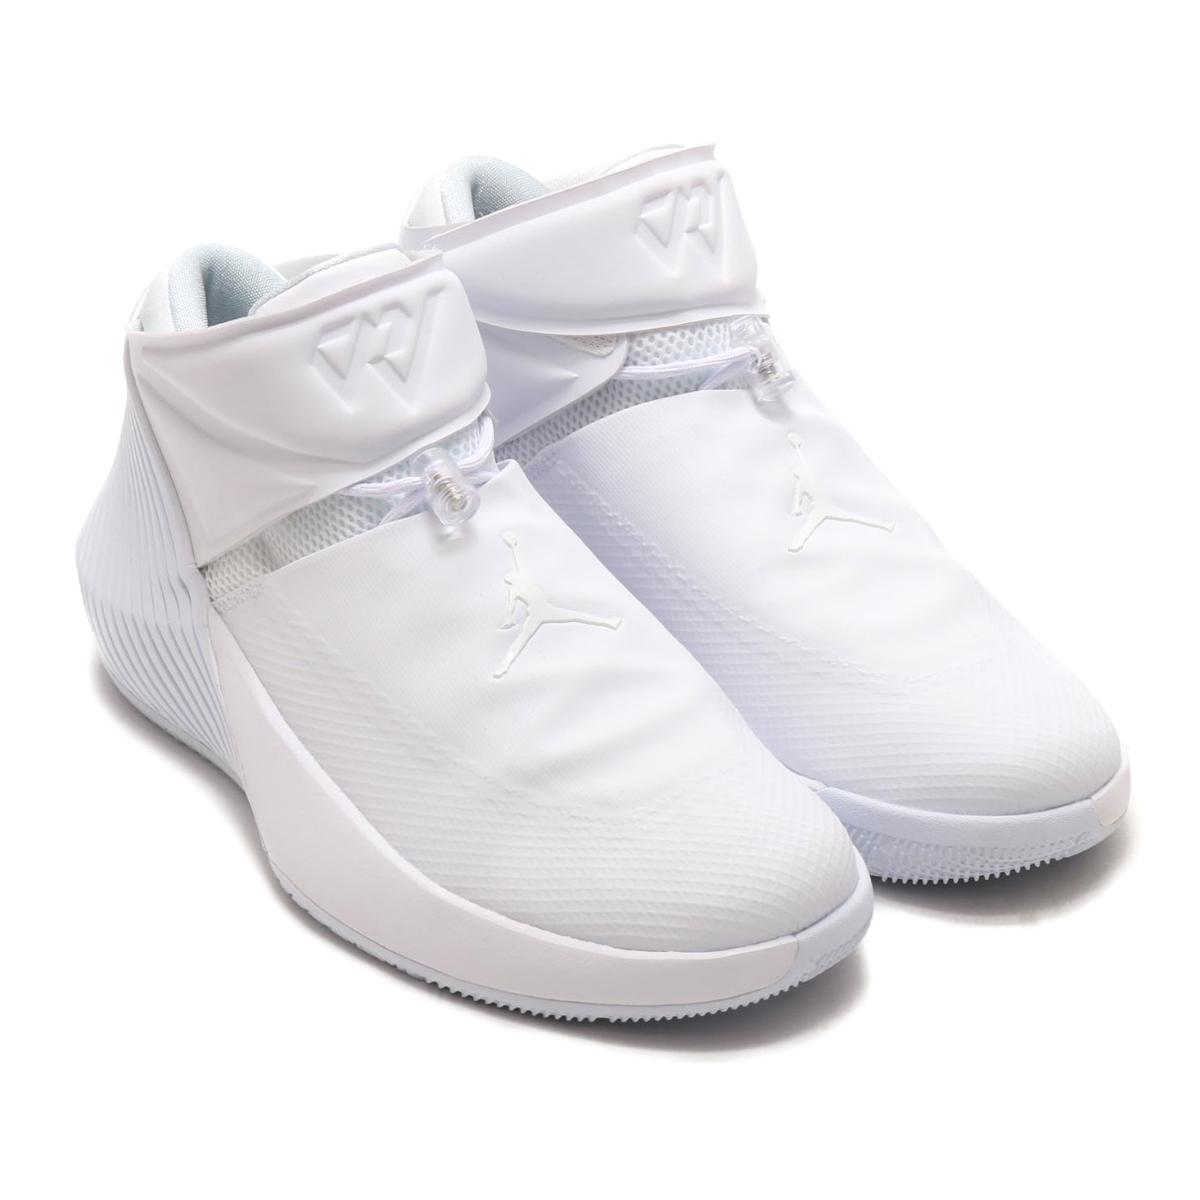 NIKE JORDAN WHY NOT ZER0.1 PFX (Nike Jordan why knot zero 1 PFX)  (WHITEWHITE-BLACK) 18SU-S